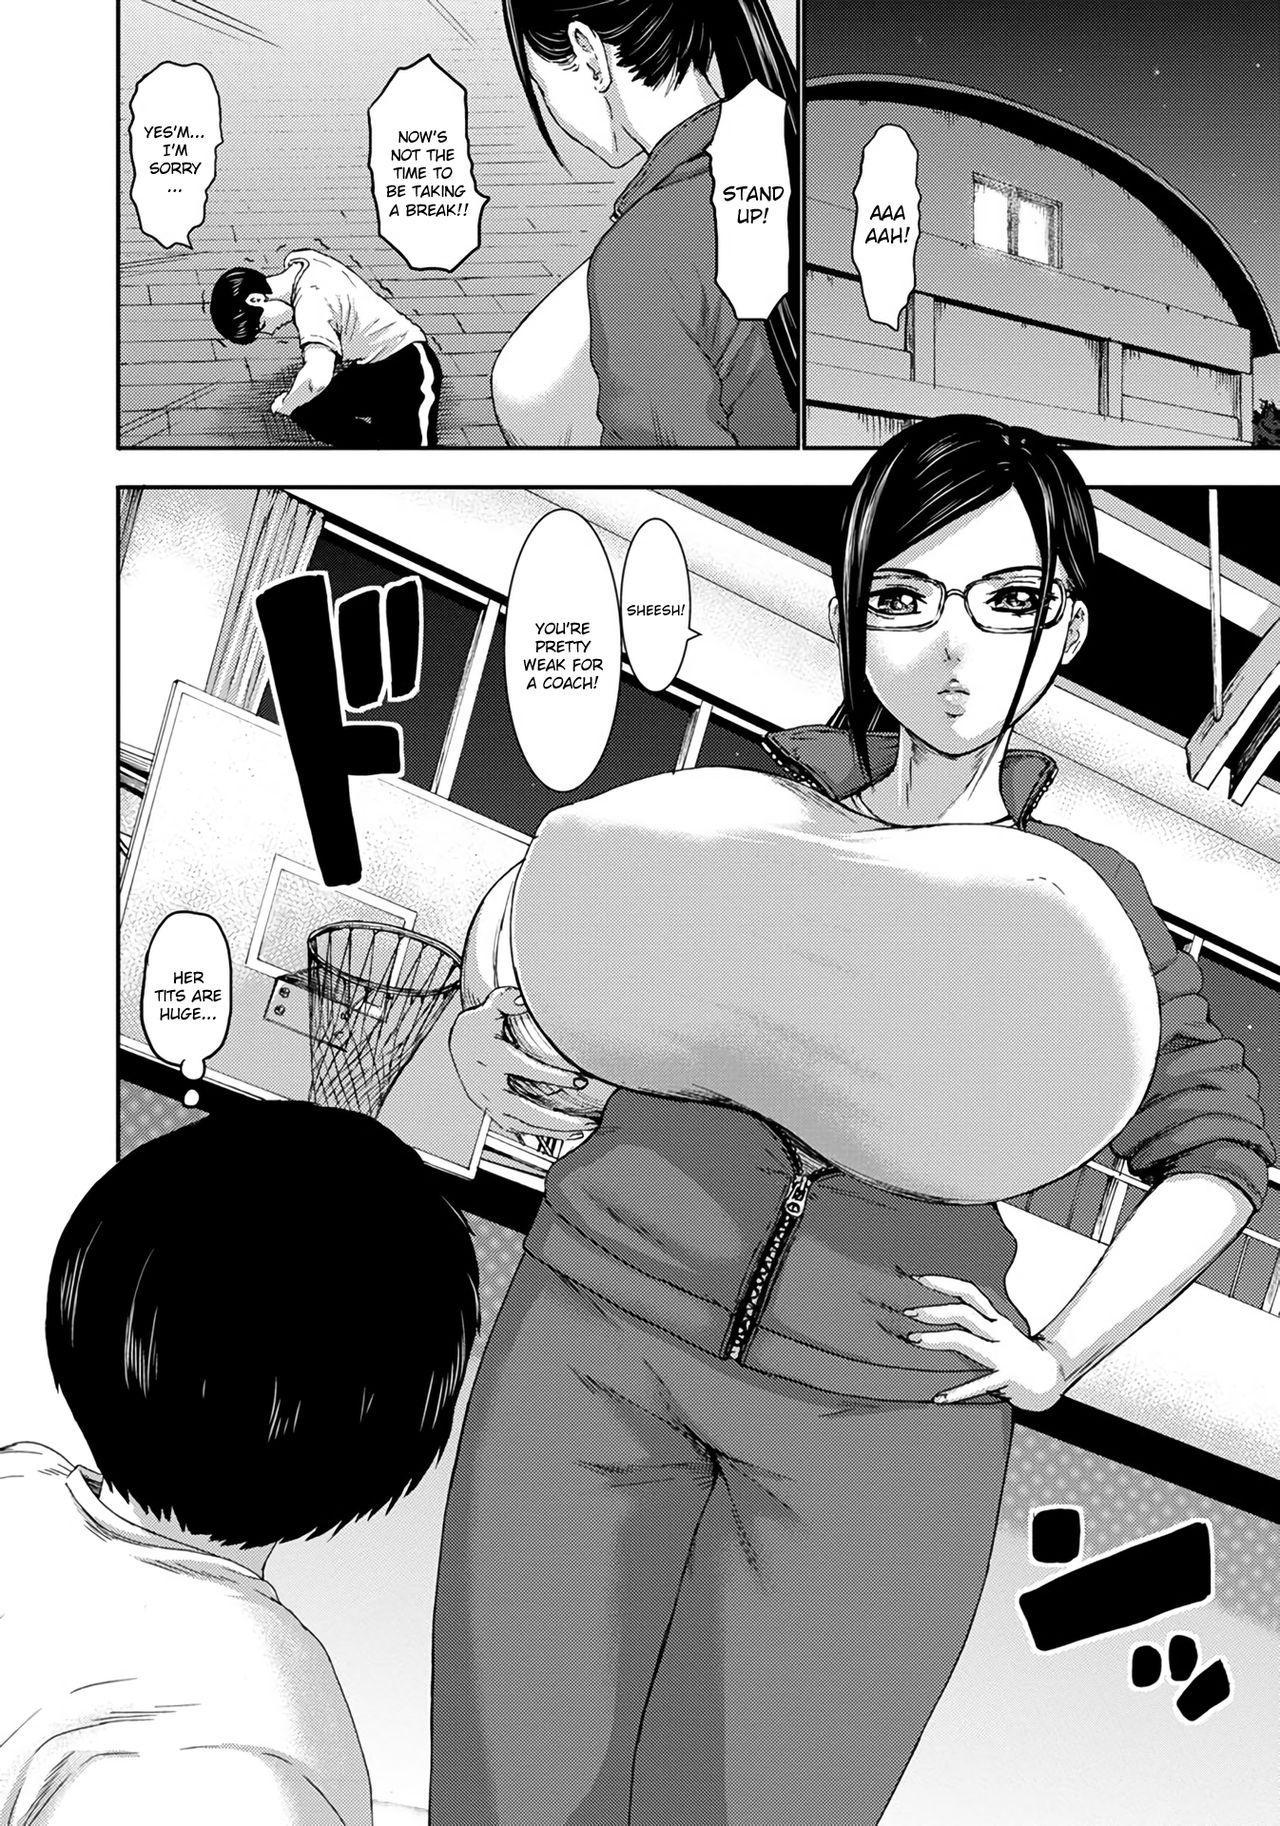 Chounyuu Gakuen | Academy For Huge Breasts 93